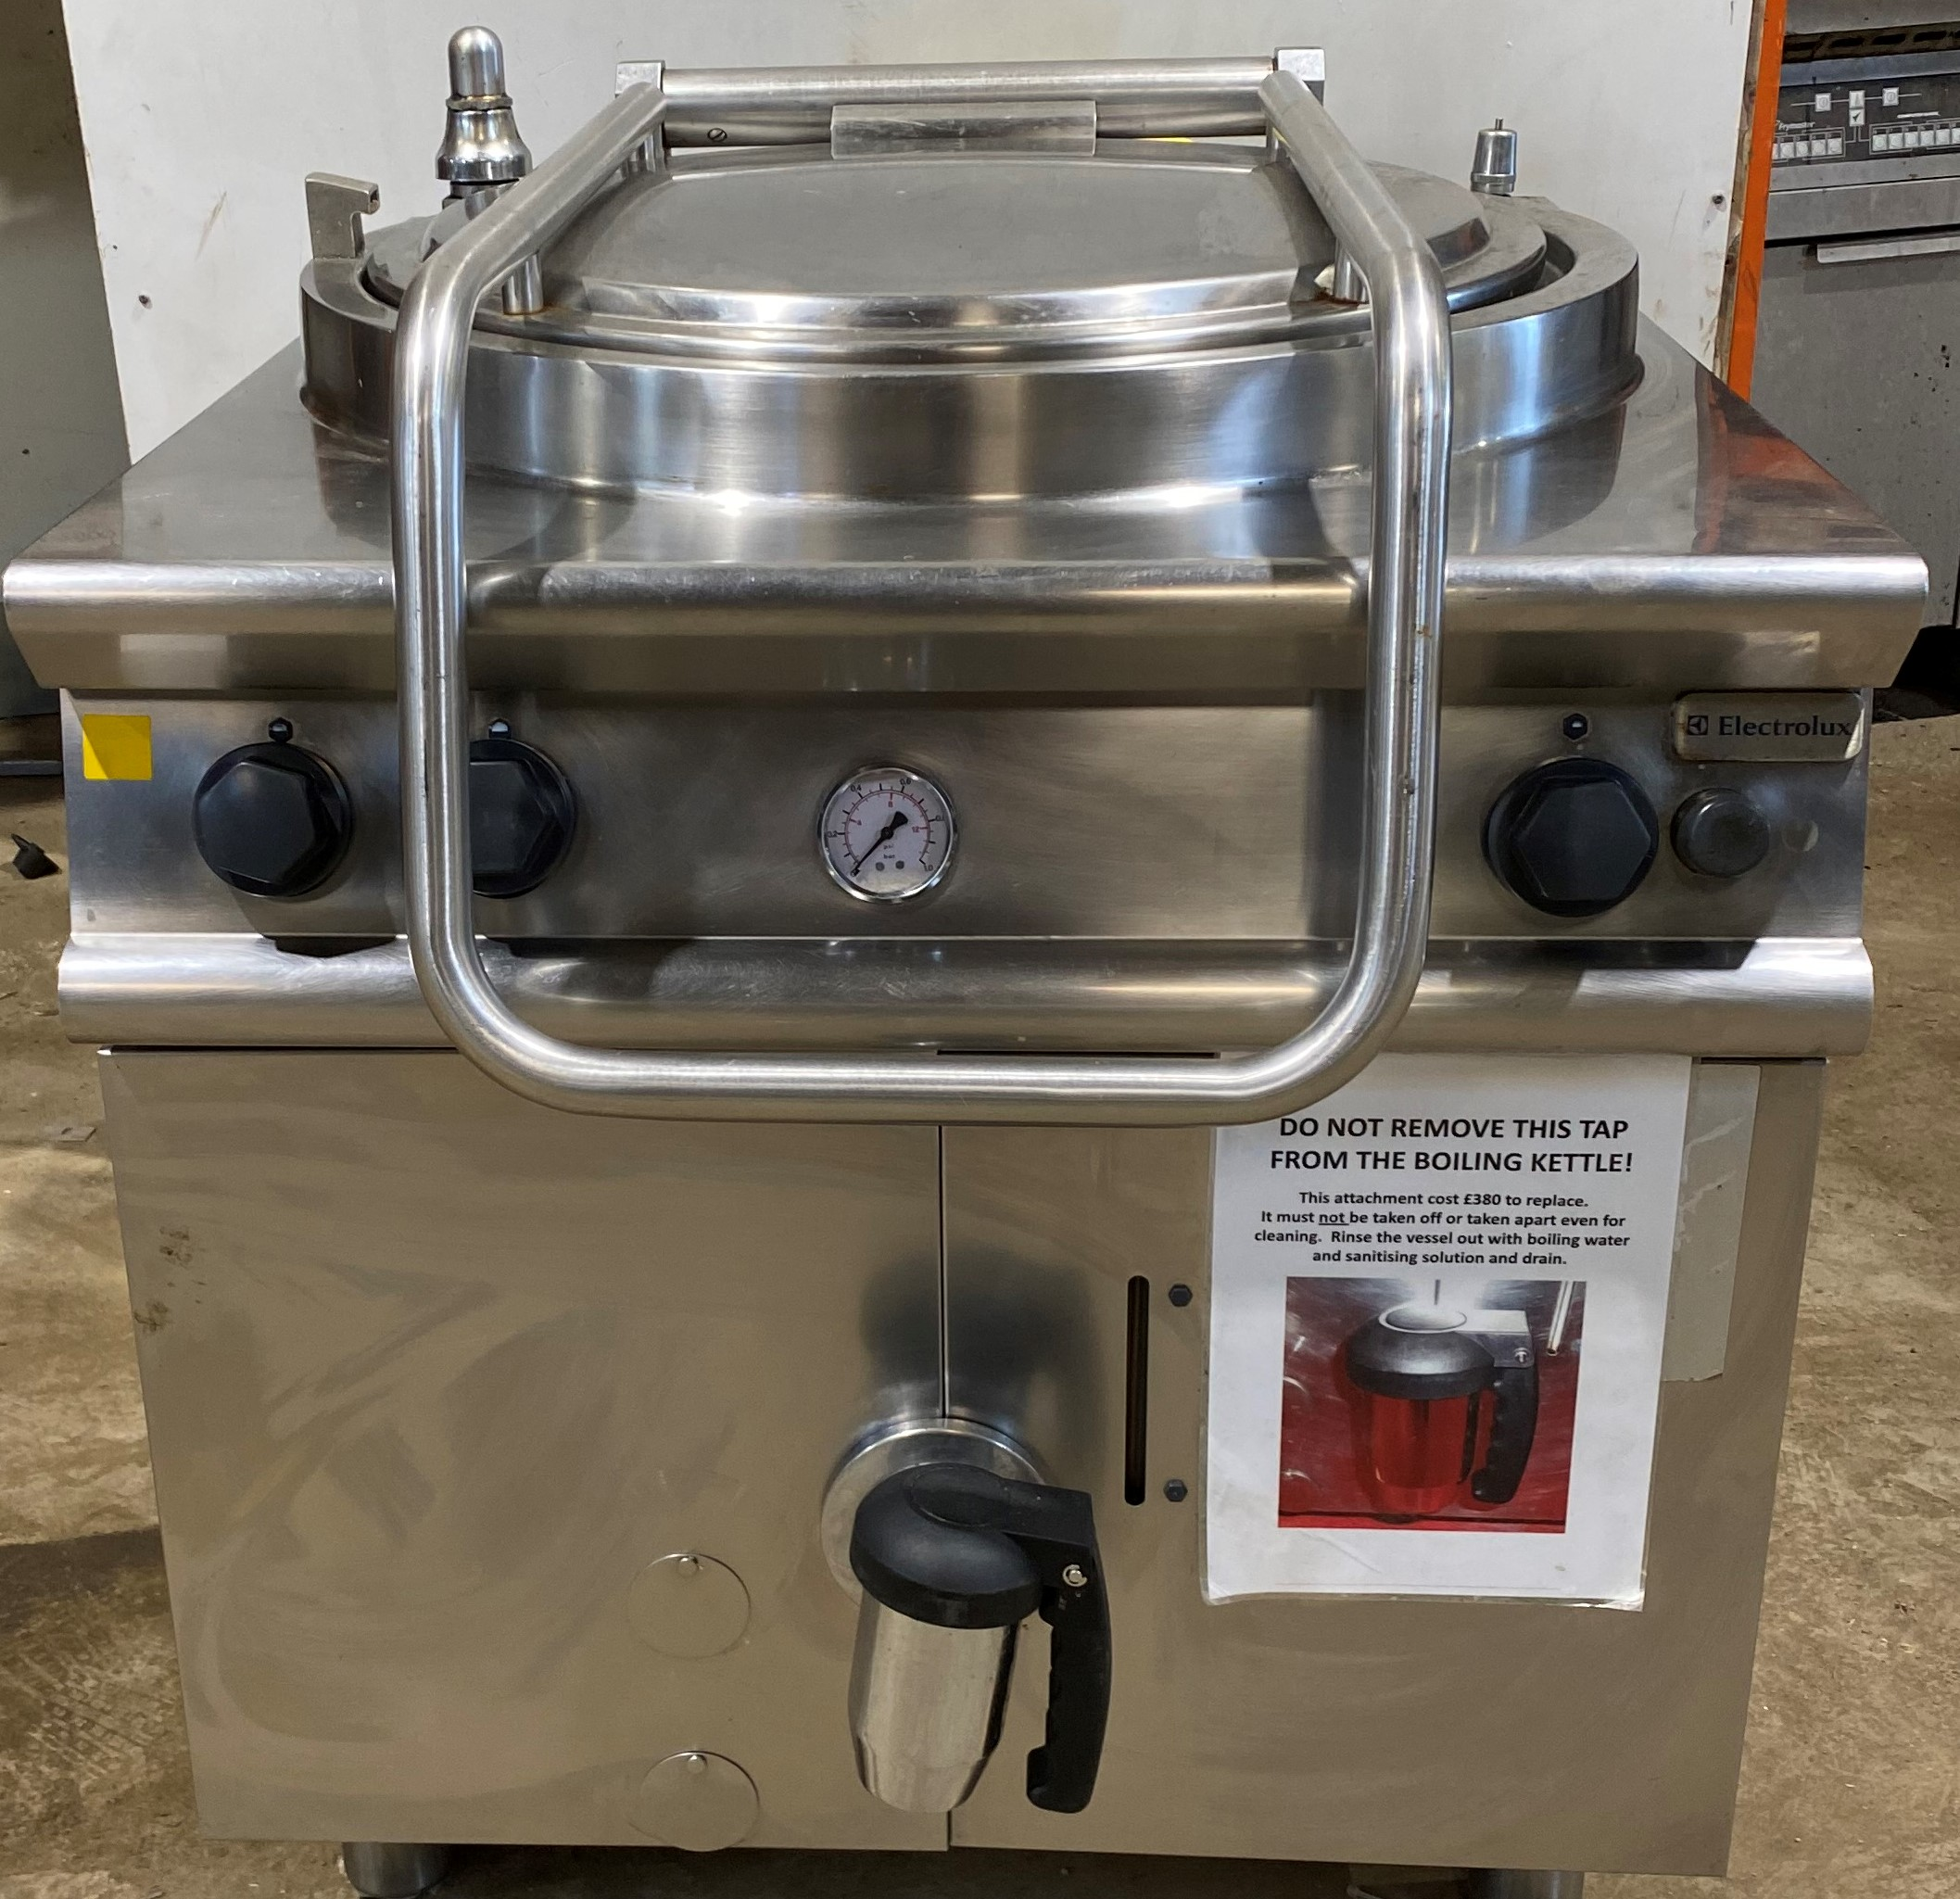 ELECTROLUX 80 Litre Gas Boiling Kettle.